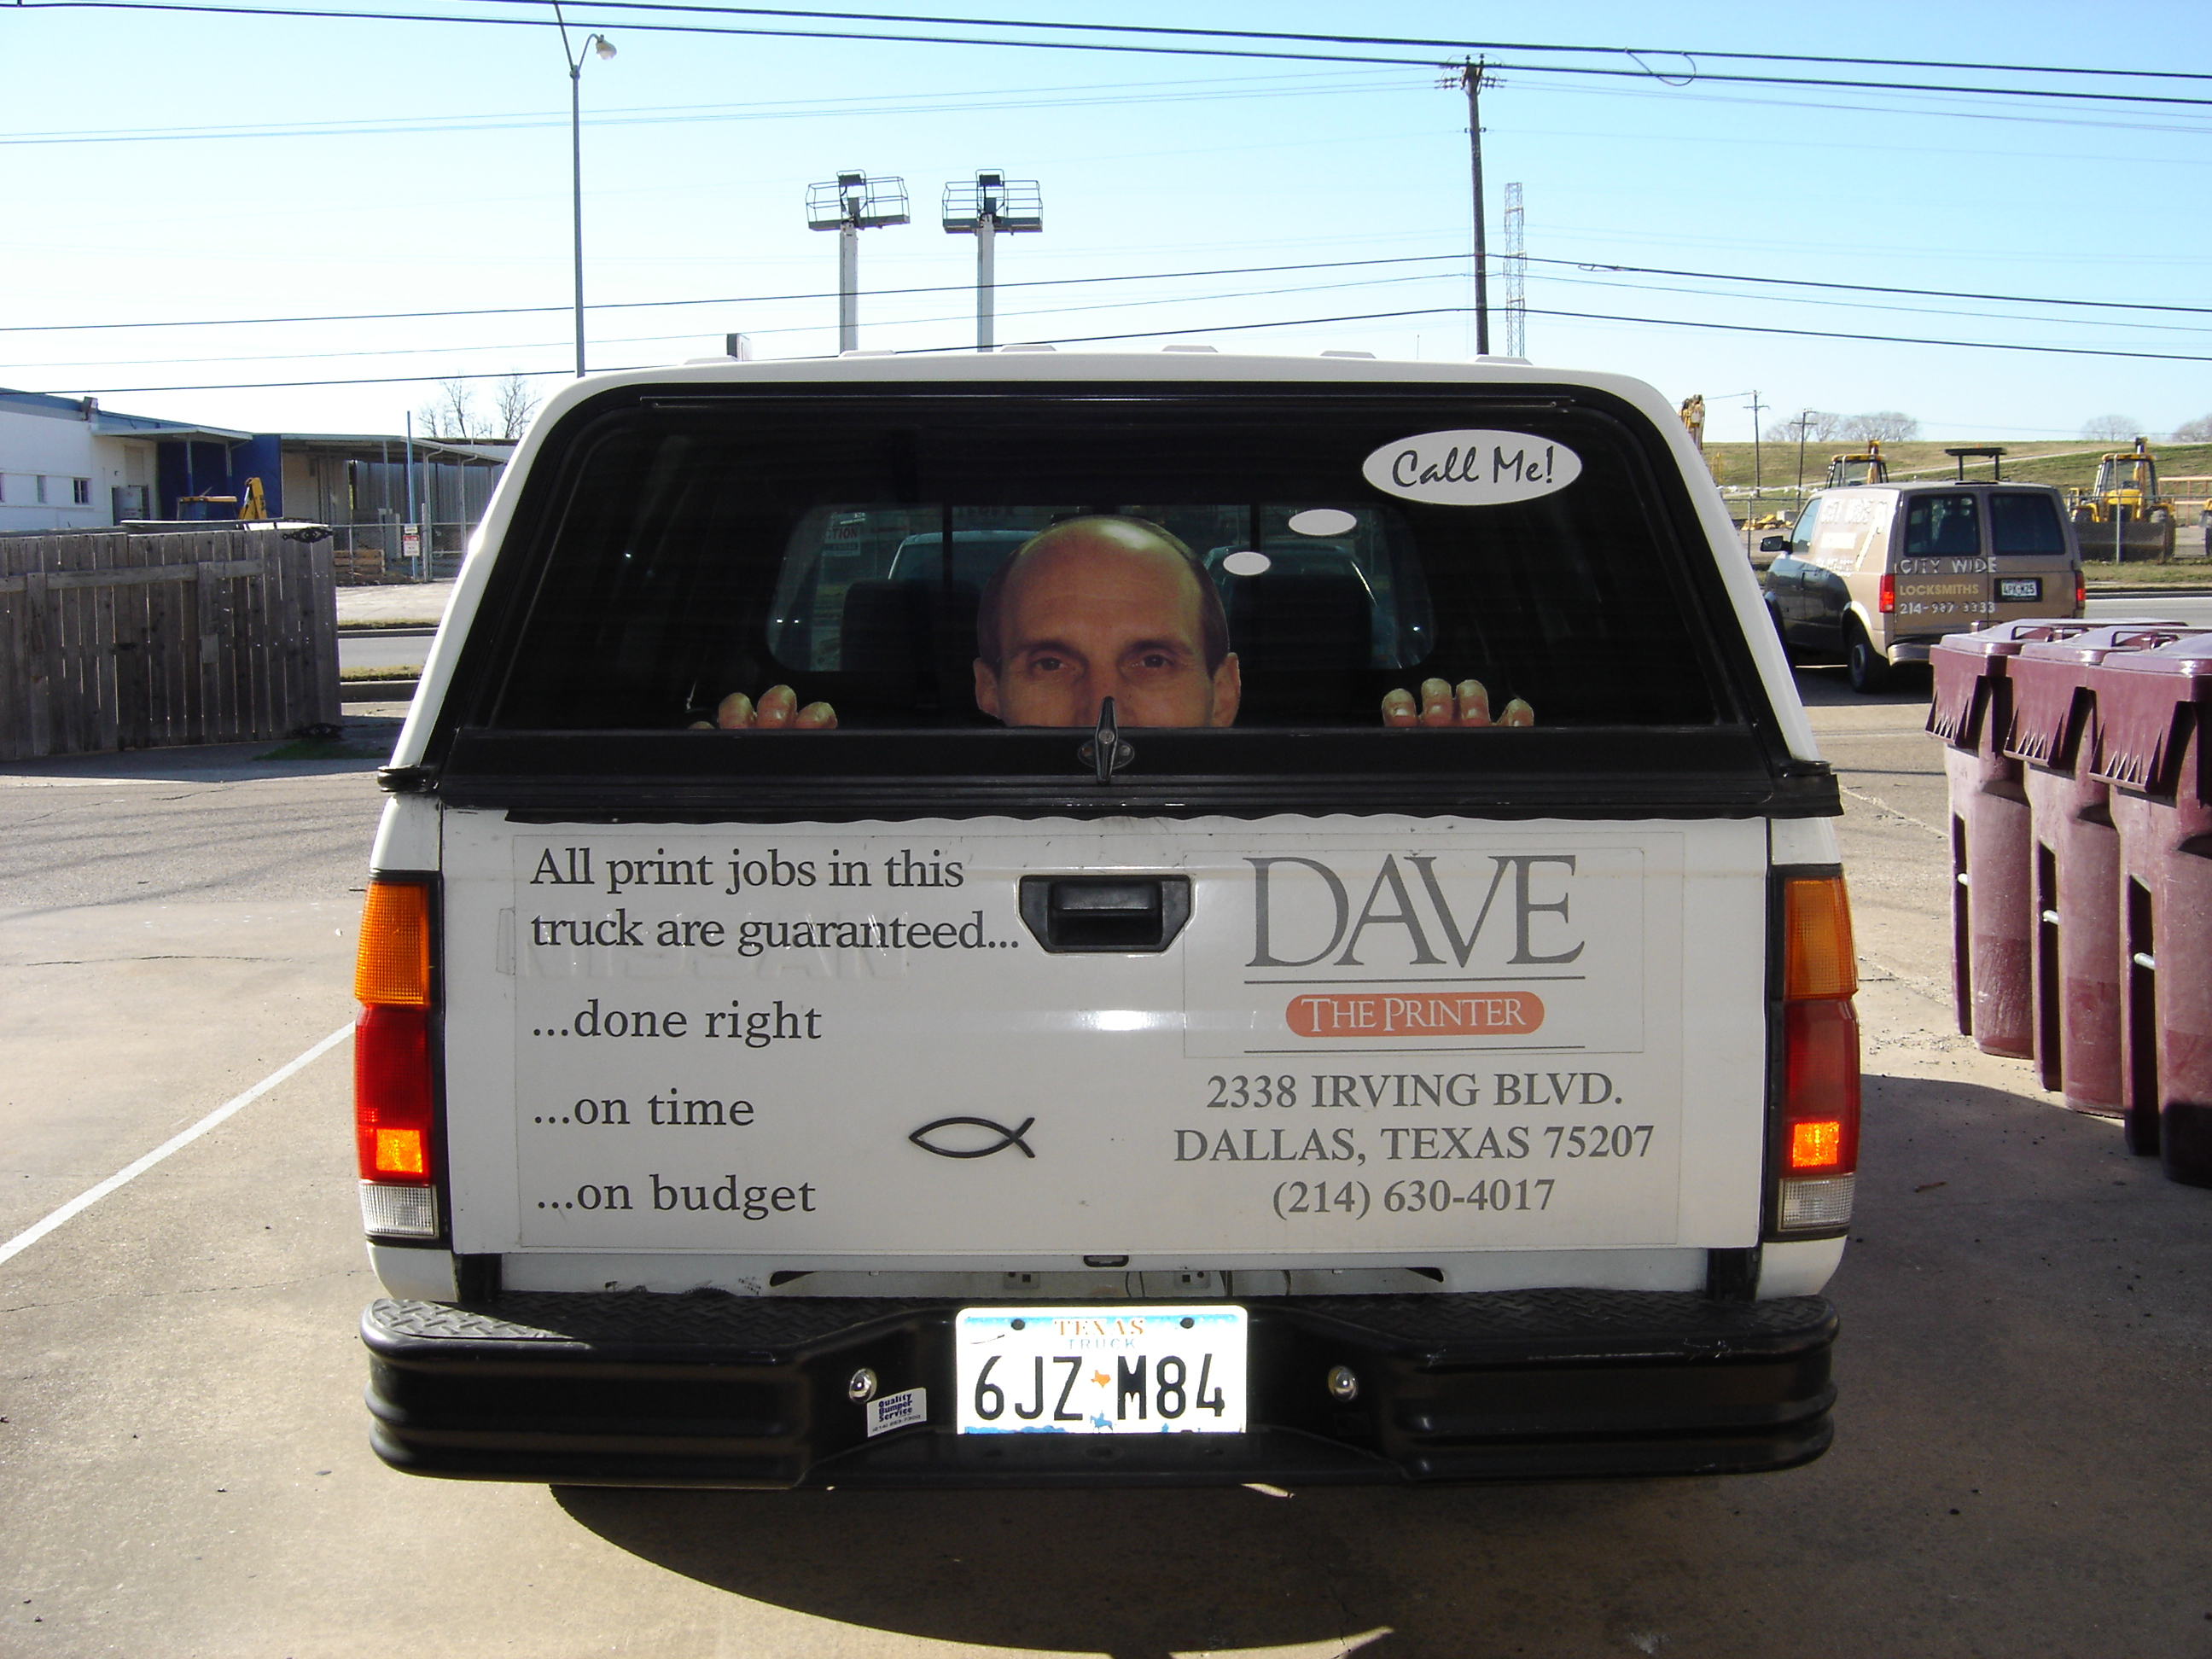 Dave the Printer guarantee